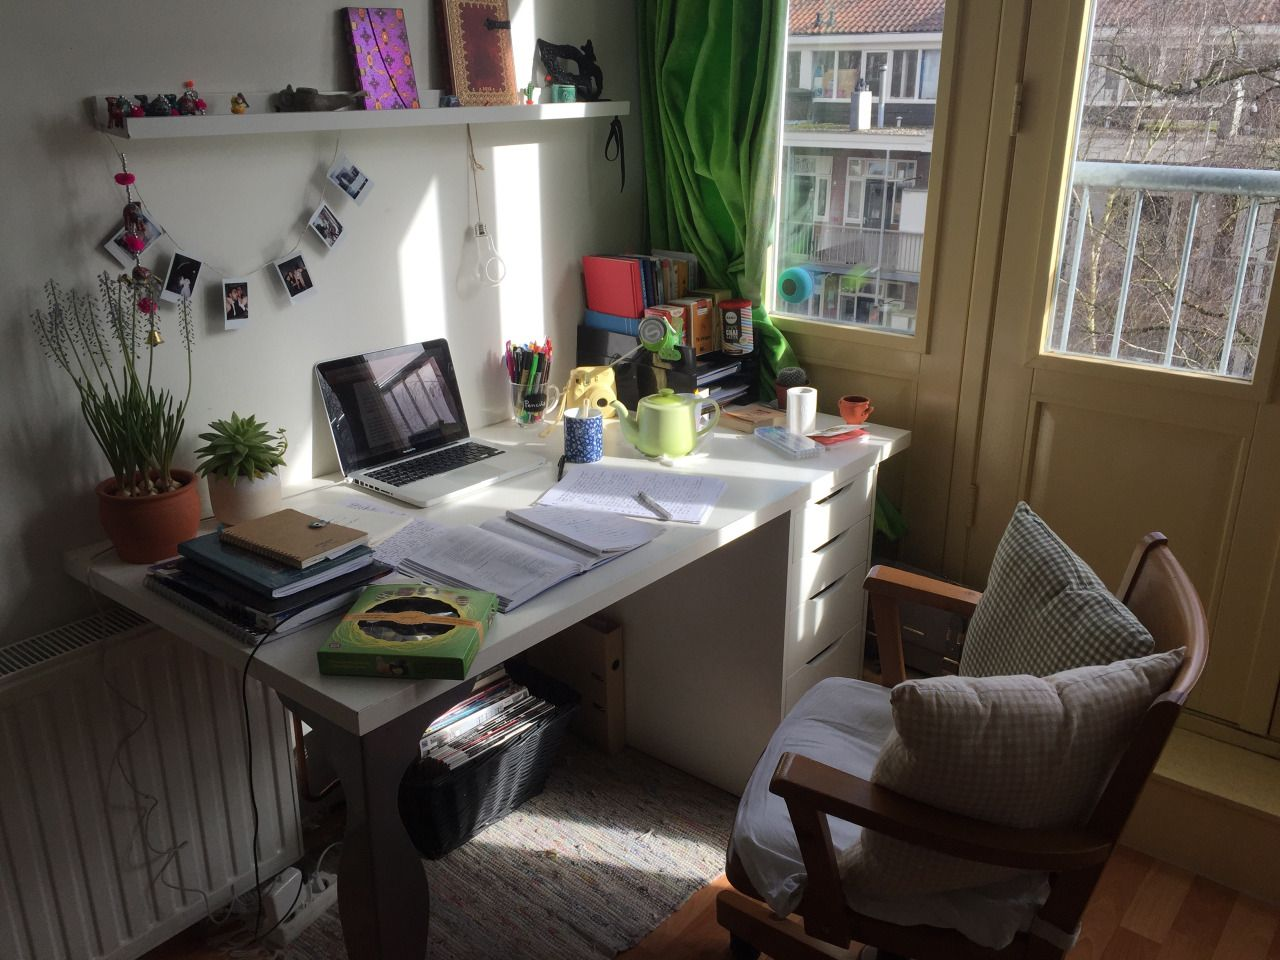 studyspiration | Cozy desk, Grunge bedroom, Diy apartments